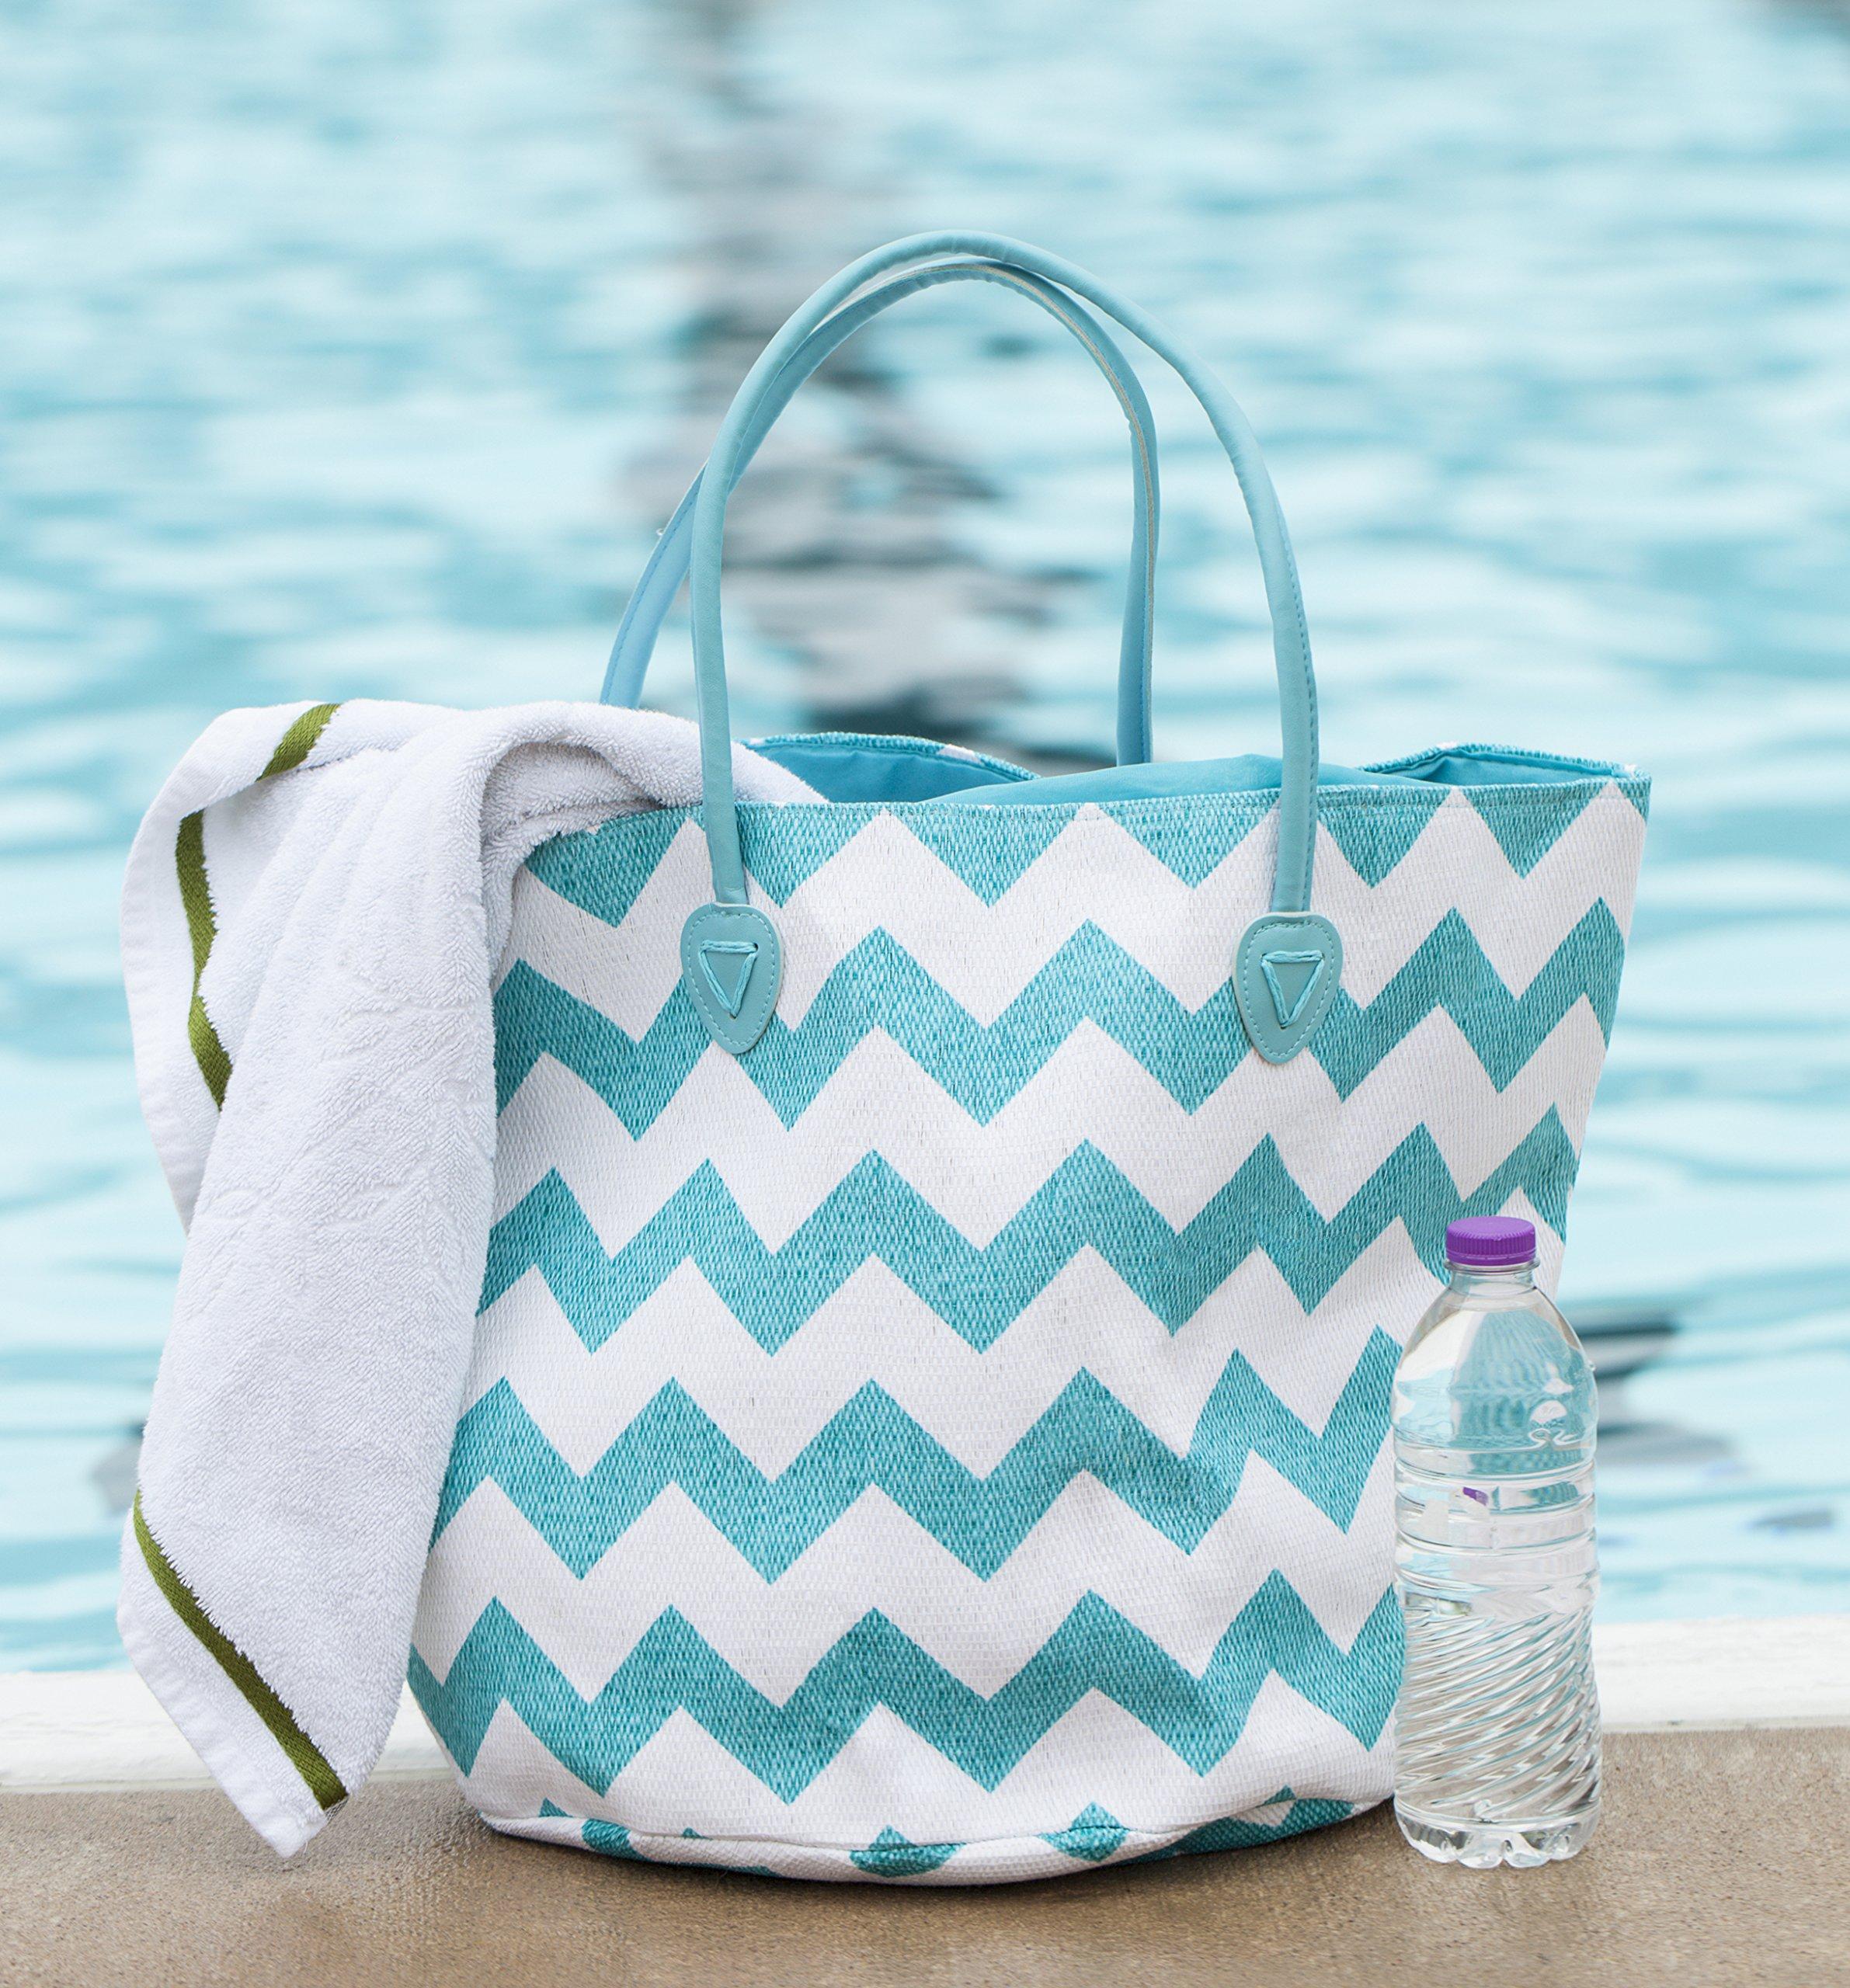 Beach Bag Large with Duffel Inner Drawstring Tote, Chevron Pattern (Light Blue White)